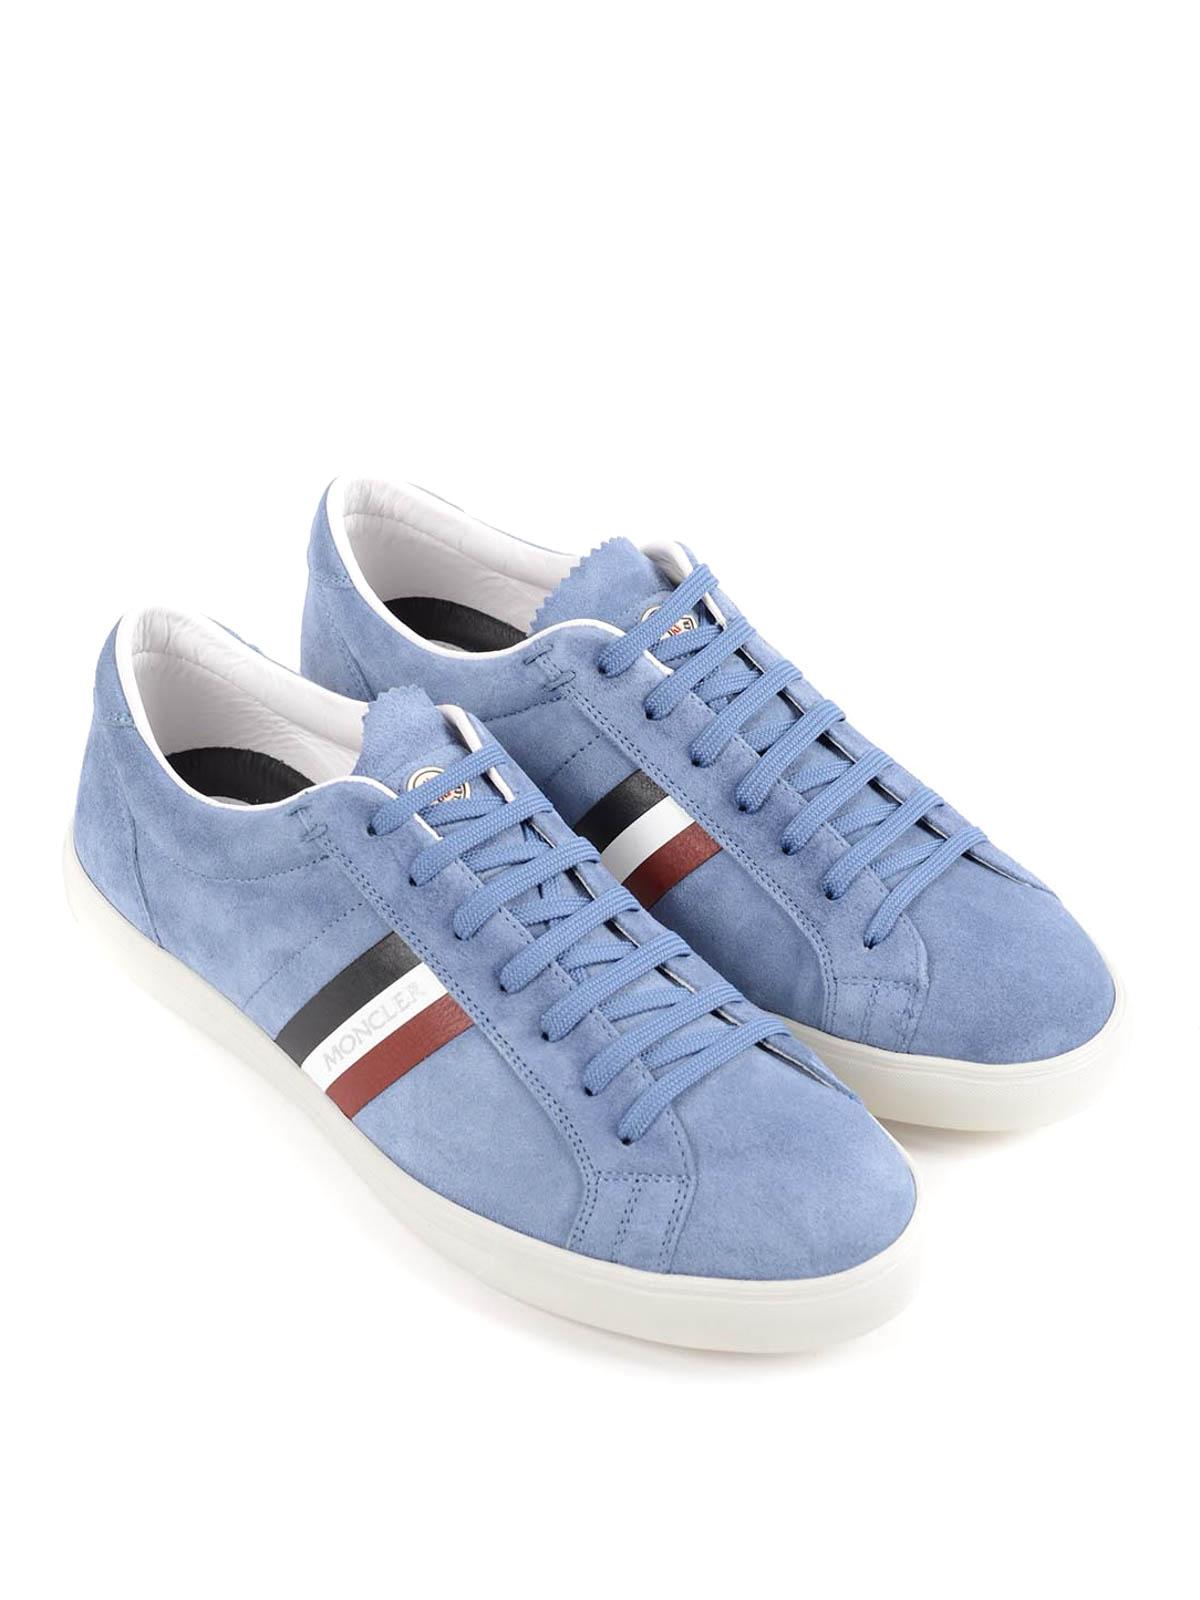 Moncler - La Monaco suede sneakers - trainers